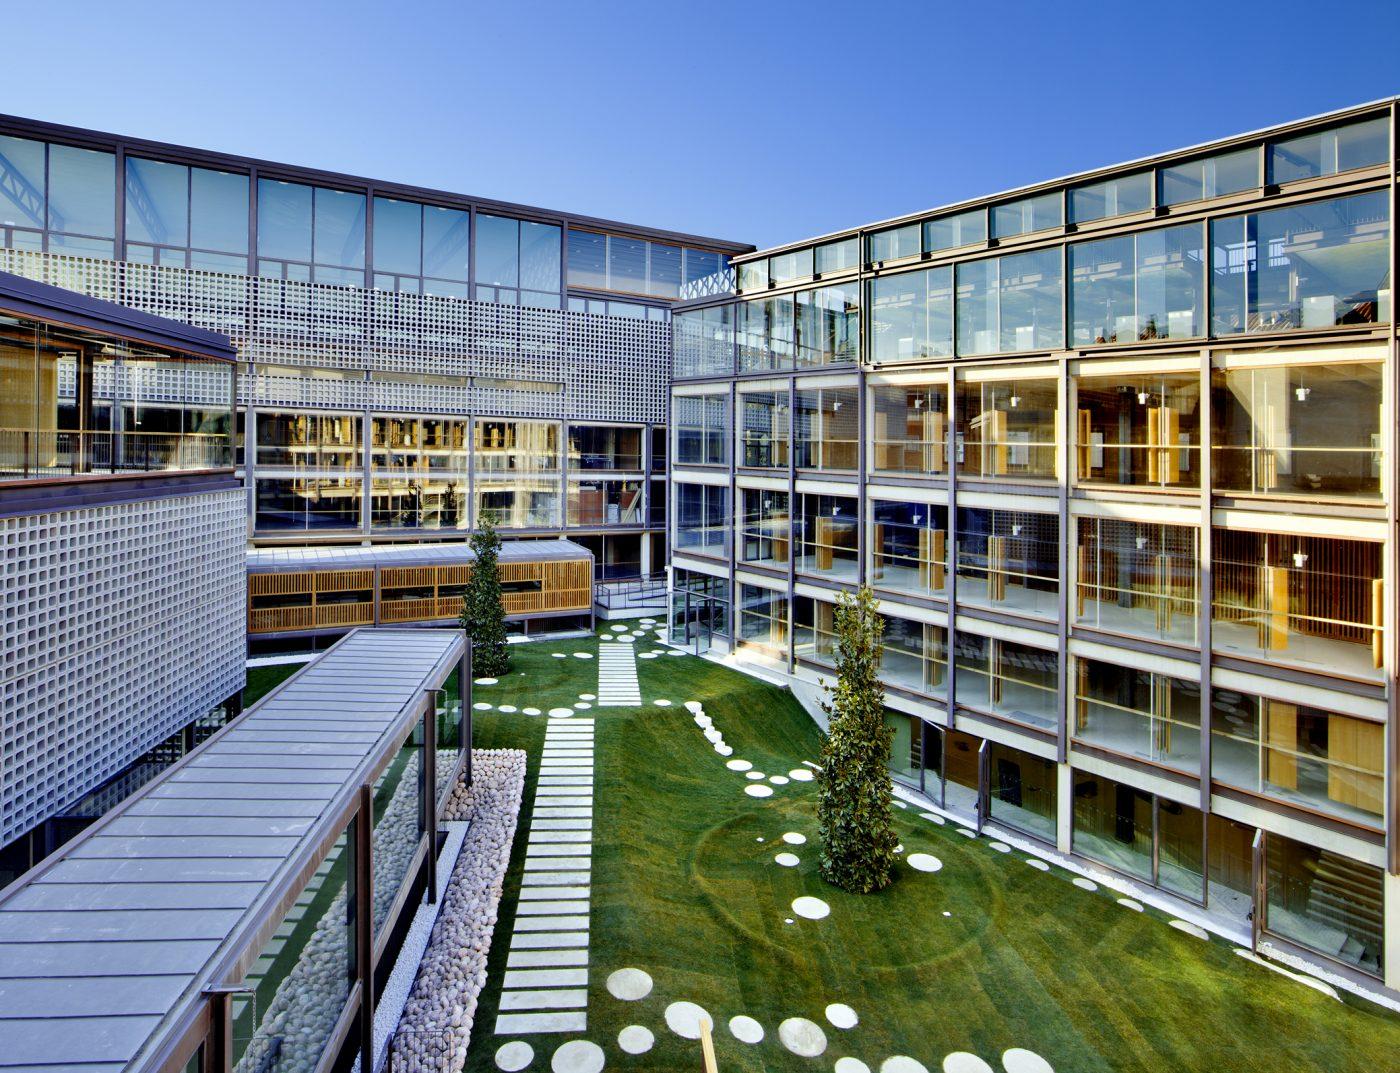 Madrid será protagonista en la XVI Semana de la Arquitectura